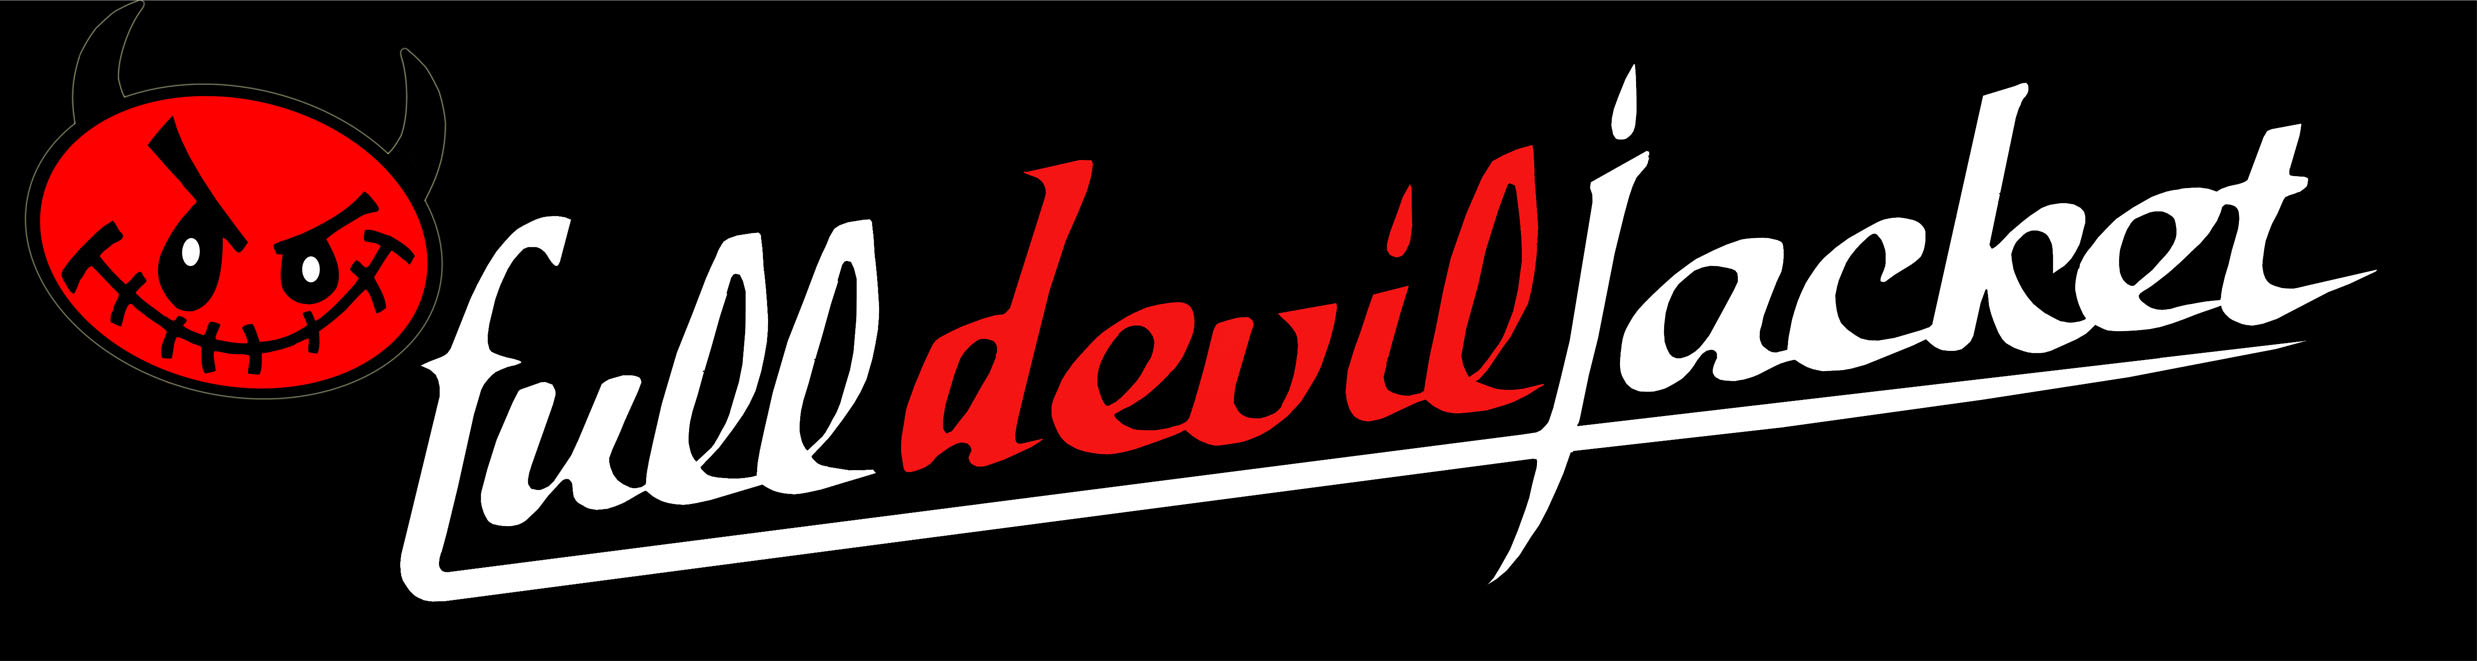 fdj logo cropped banner